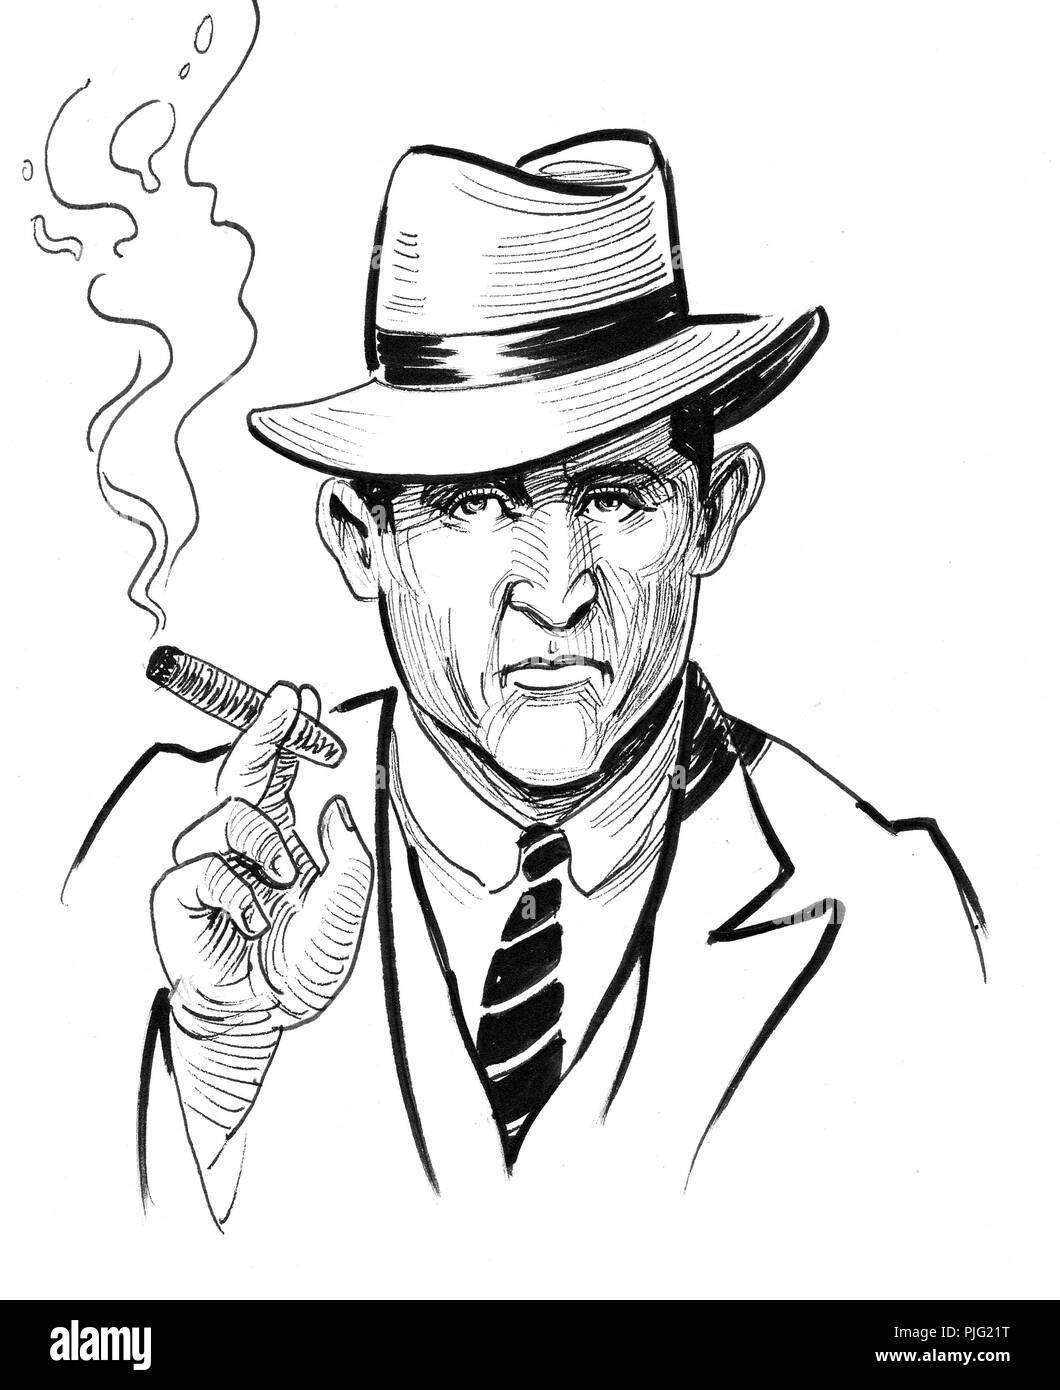 Mafia Stock Fotos Alamy Immaginiamp; Cigar PikZOXu